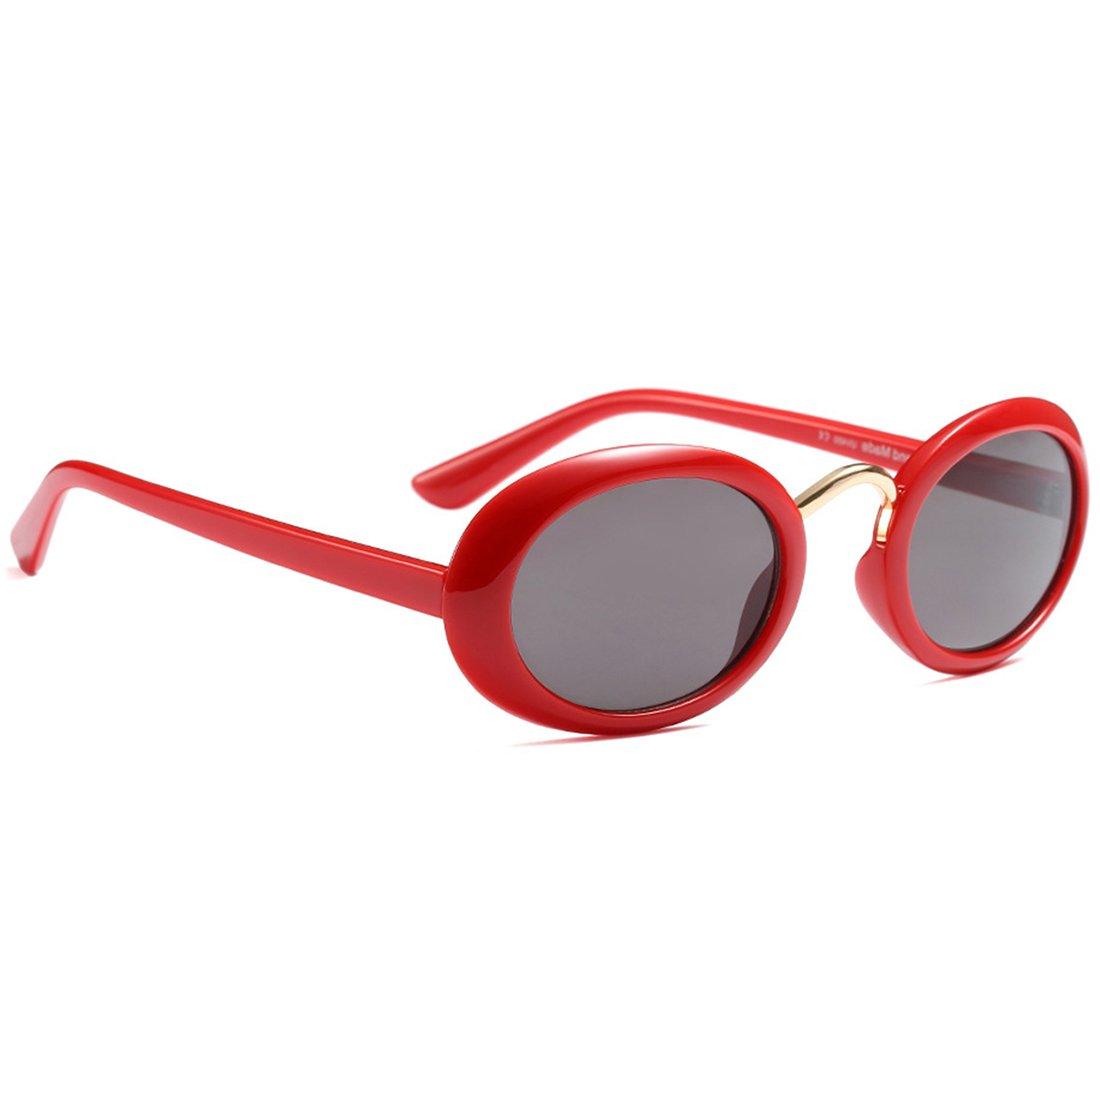 color3 modesoda Women's Sunglasses Round Small Frame Metal Bridge